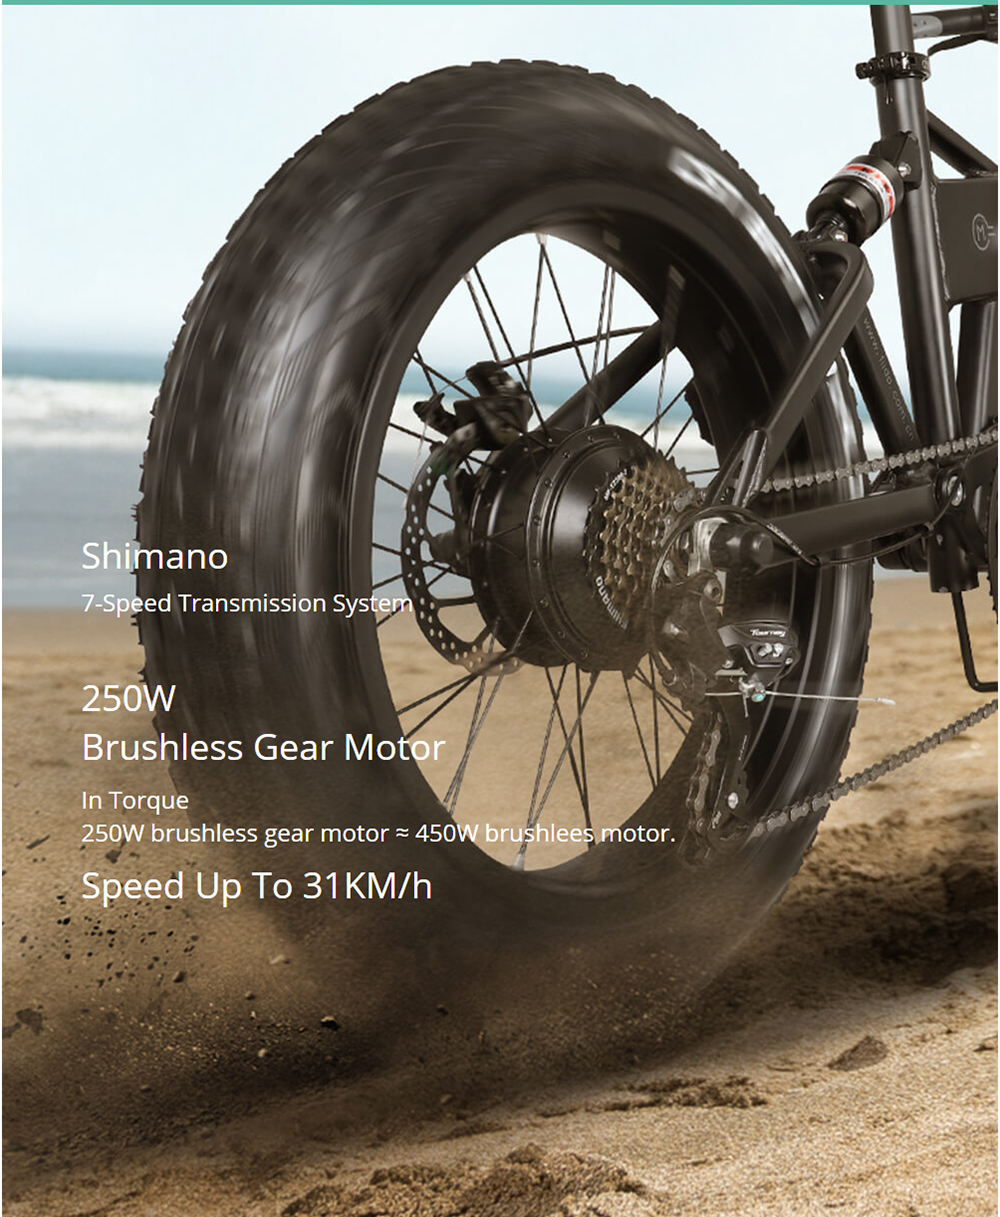 Electric E-Bike bike has a large real world range of 40 miles.